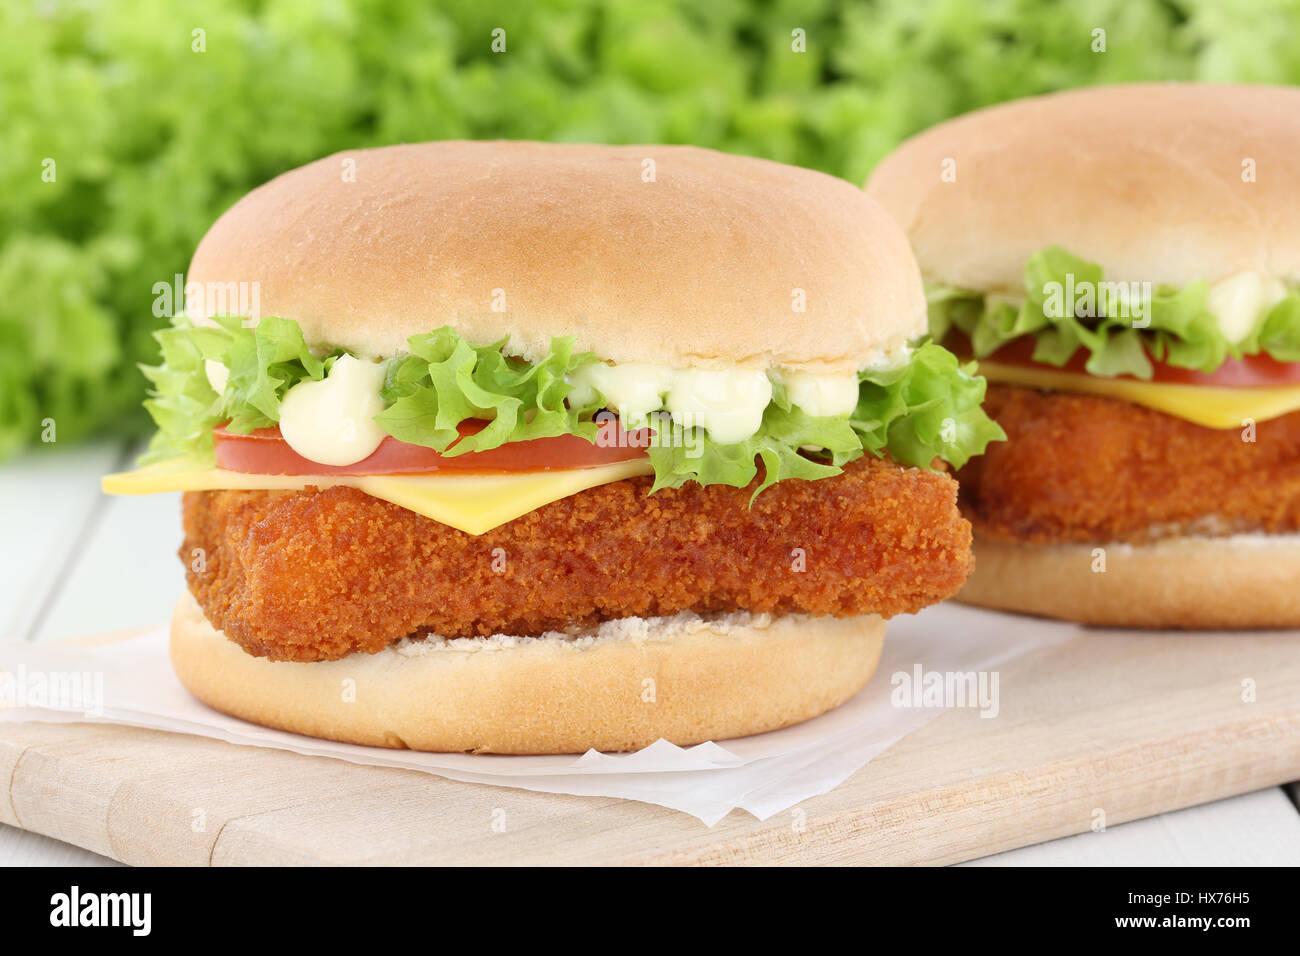 Fisch Burger Fishburger Hamburger Tomaten Käse ungesundes Essen Stockbild